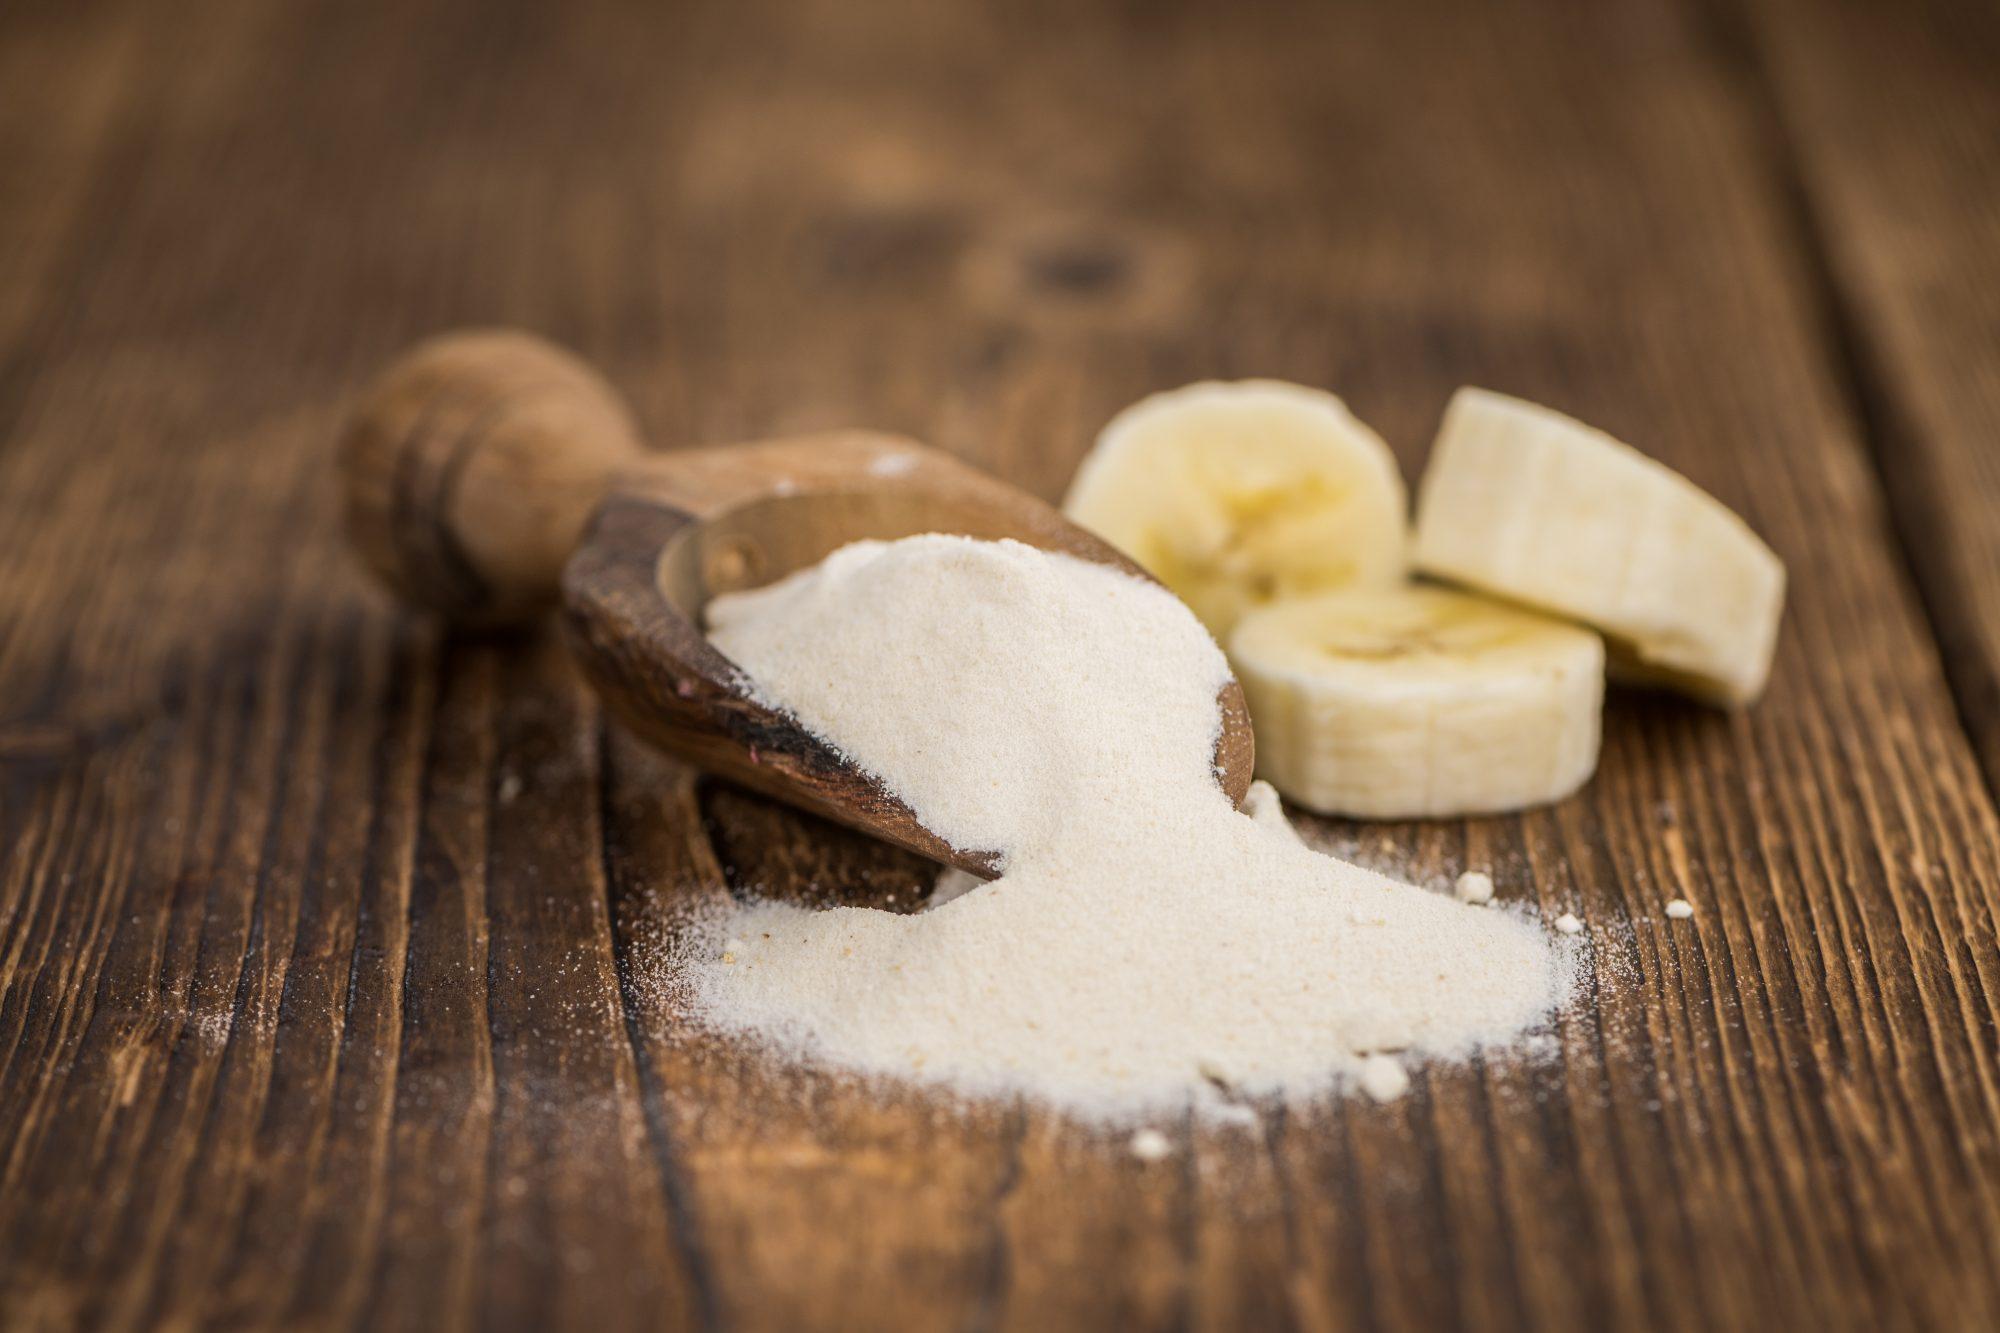 getty-banana-flour-image